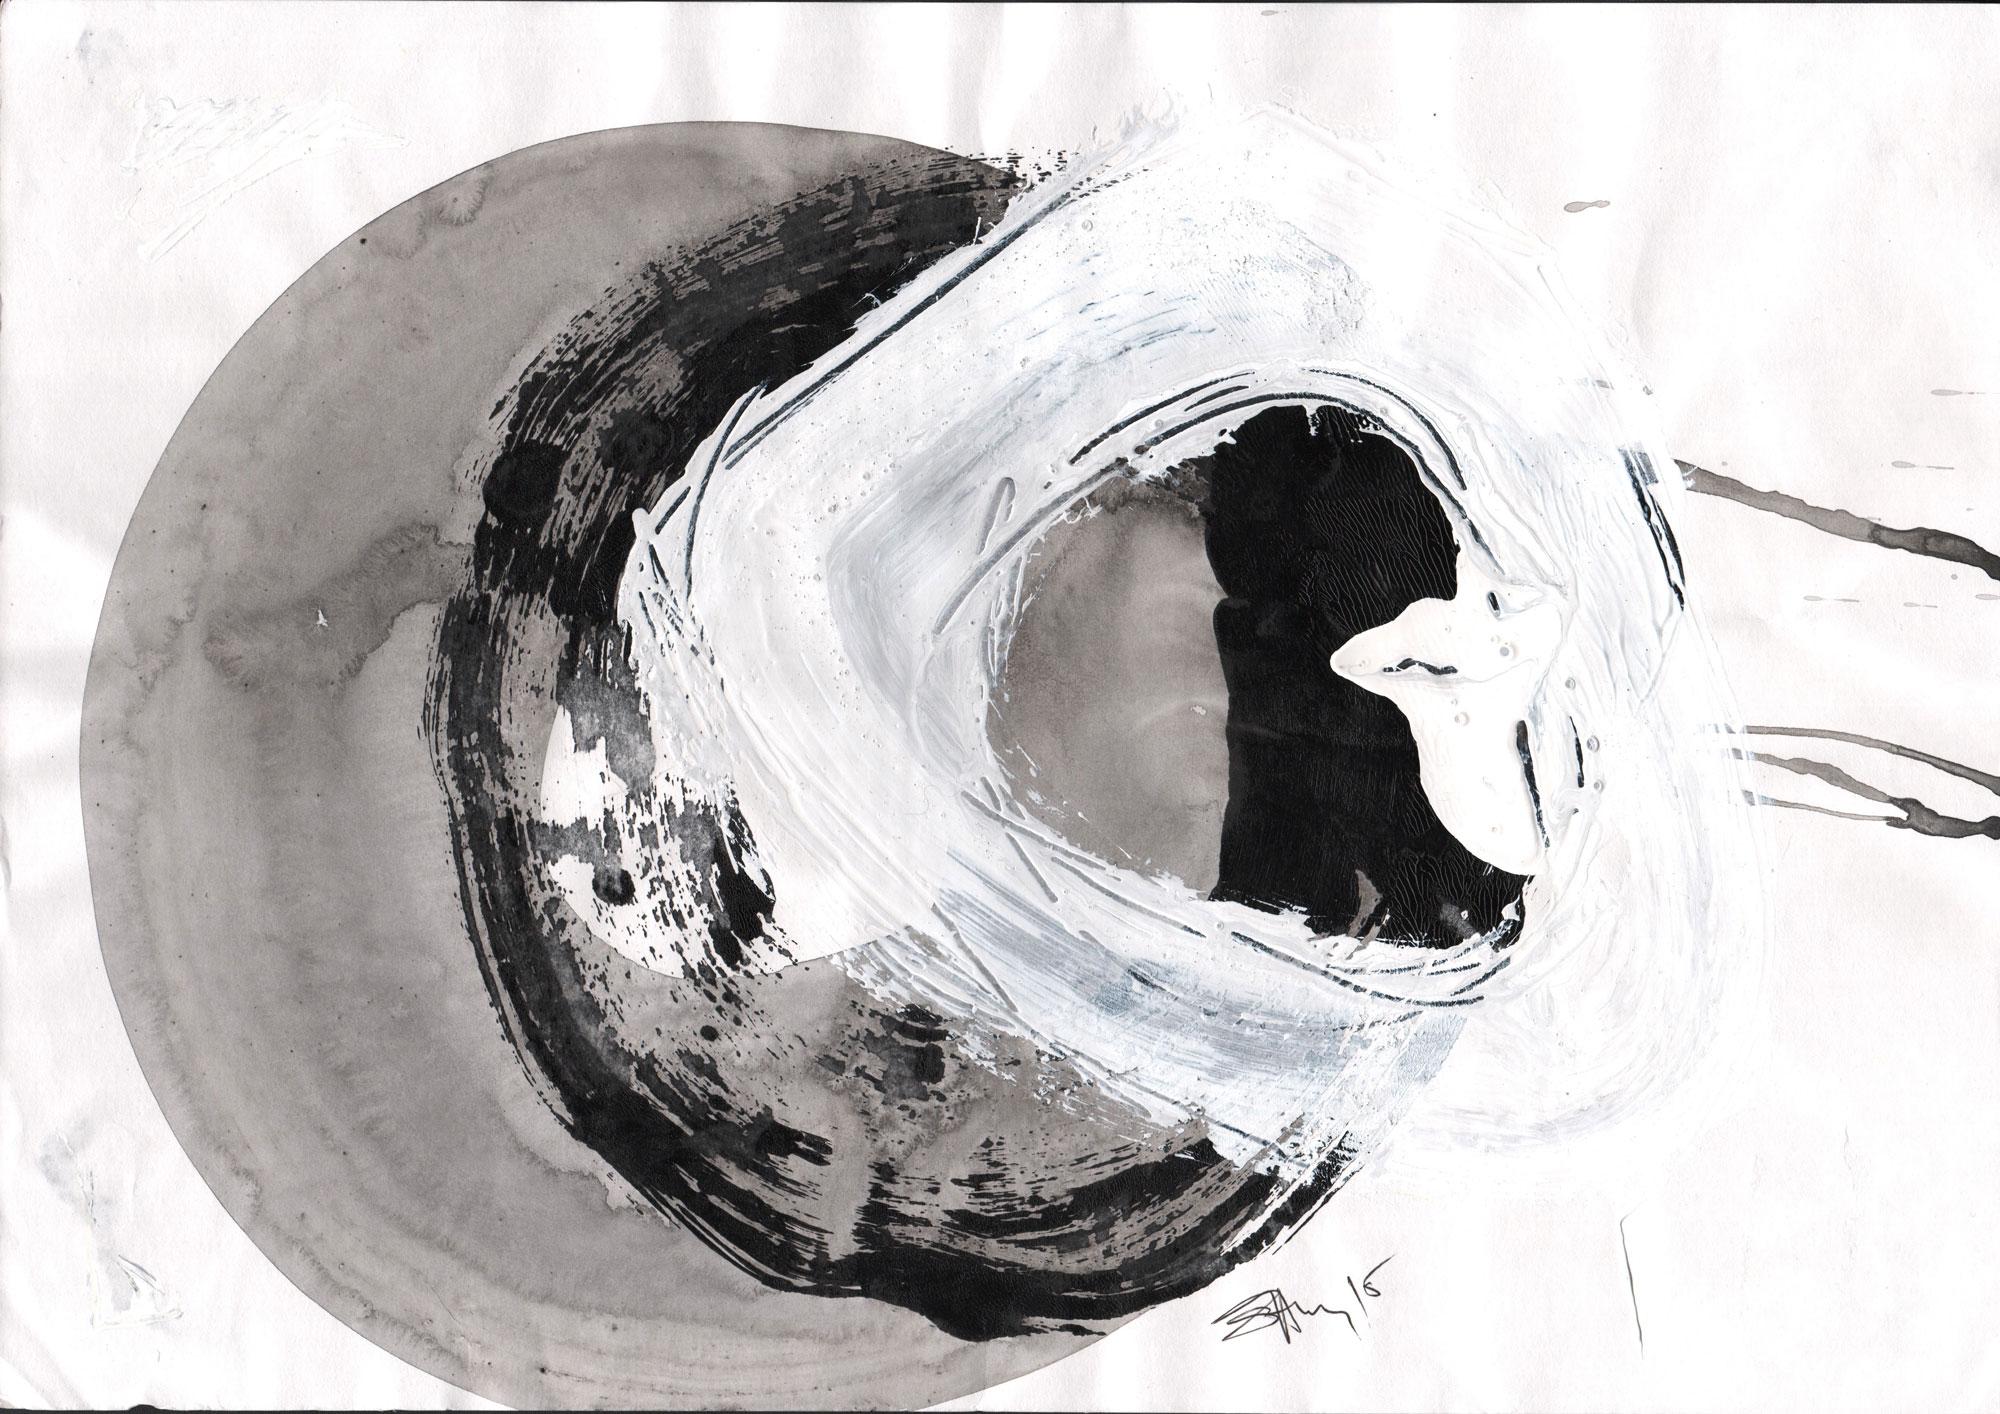 Jerca SANTEJ (1964) Slovenia  Circle 3, 2013  Acrylic on paper, 30 x 42cm